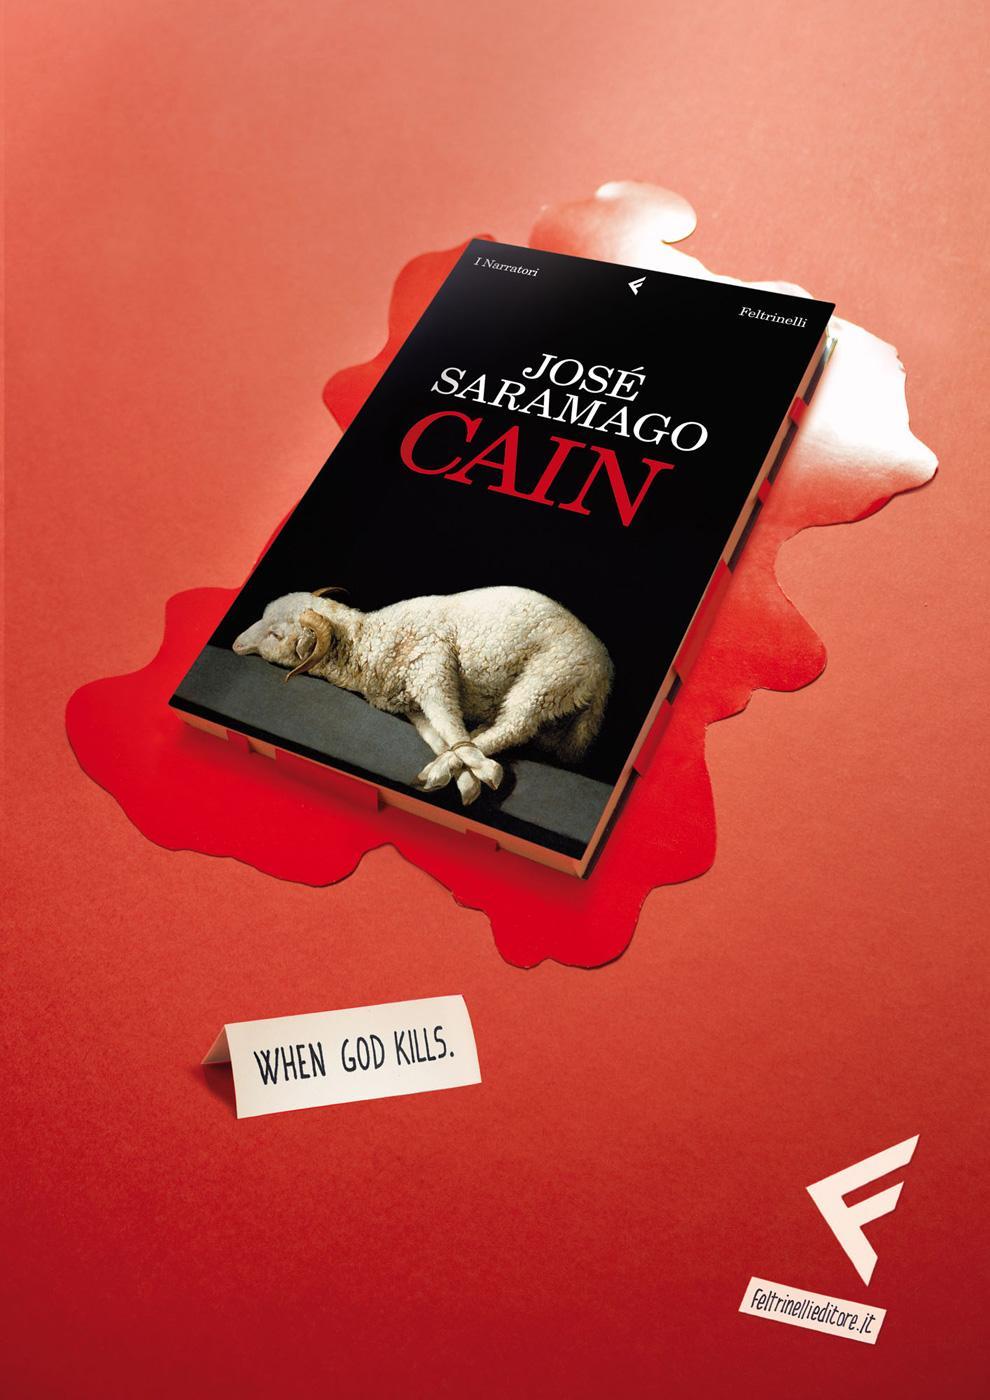 Feltrinelli Print Ad -  When God kills